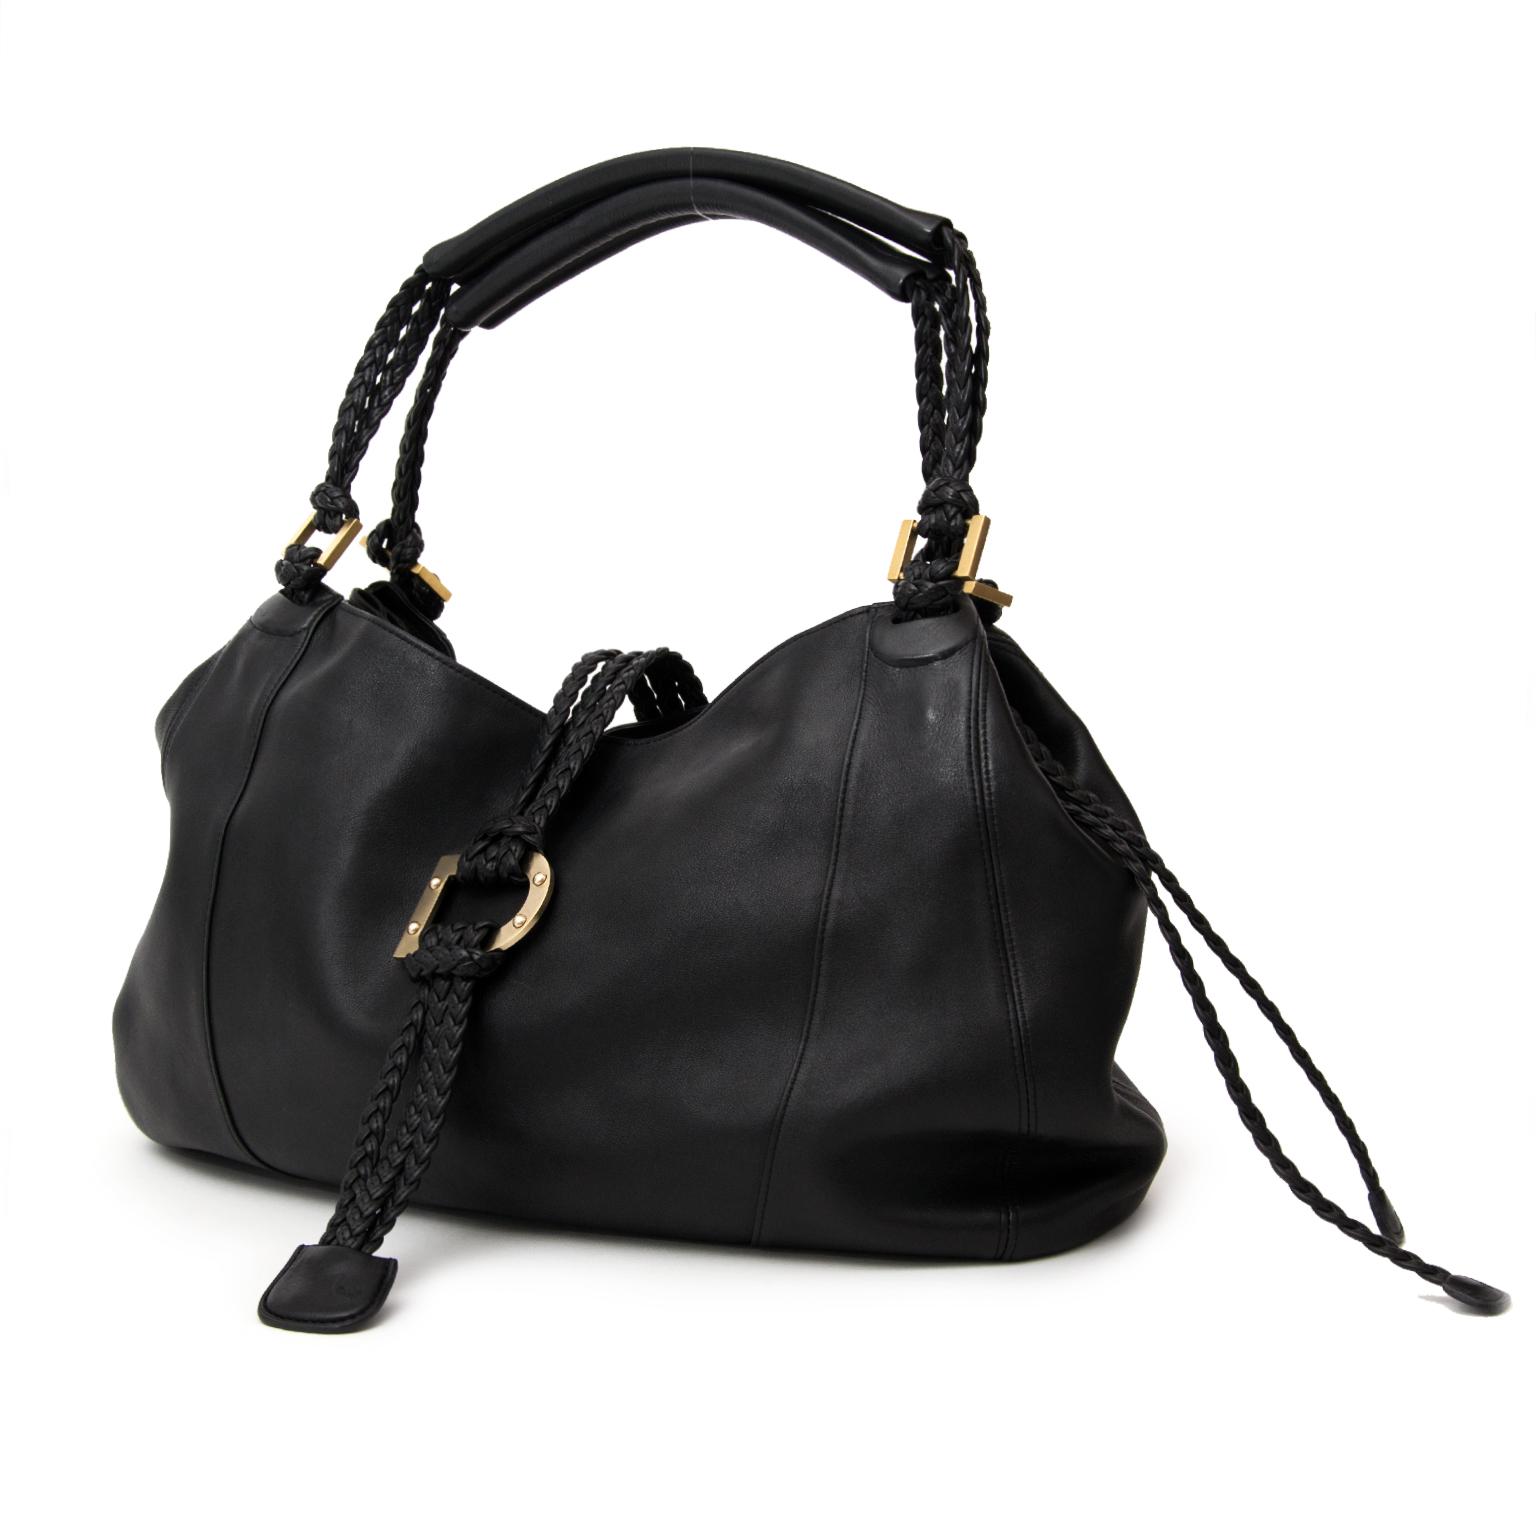 prix d un sac birkin borse hermes neuf how much is a birkin bag. Black Bedroom Furniture Sets. Home Design Ideas